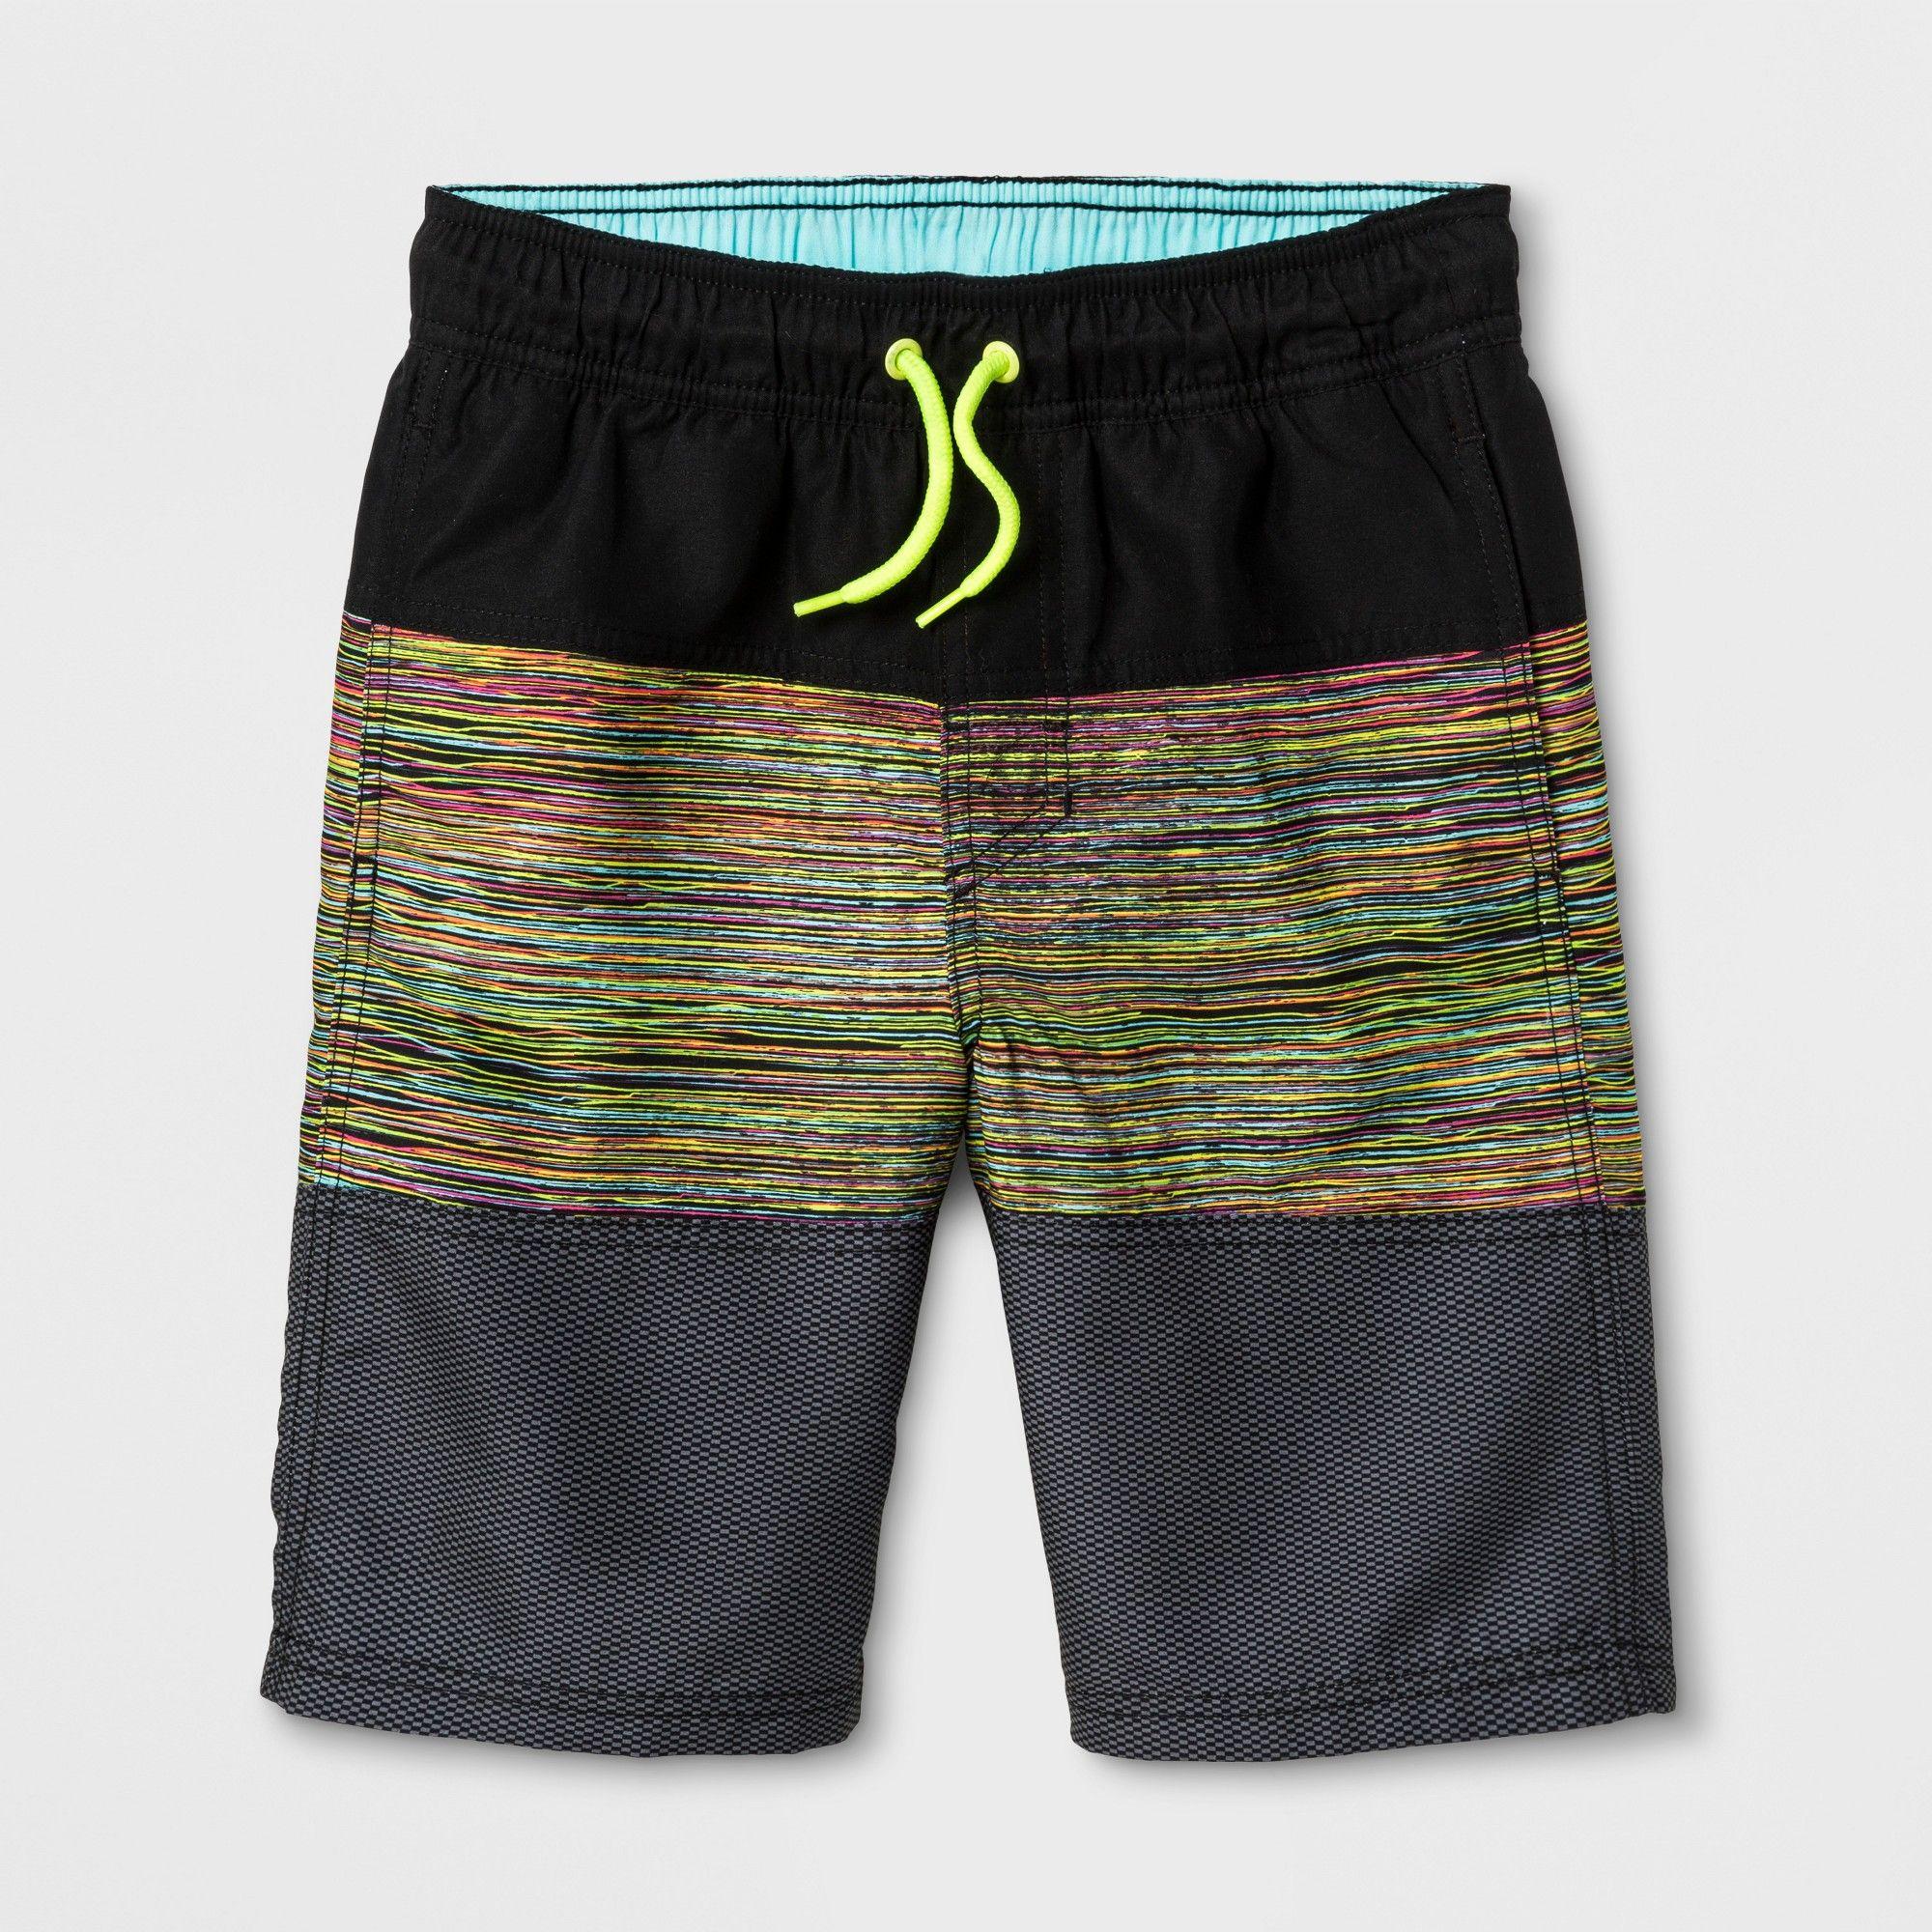 18c60b35d5835 Boys' 3 Tier Textured Swim Trunks - Cat & Jack XS, Black | Products ...